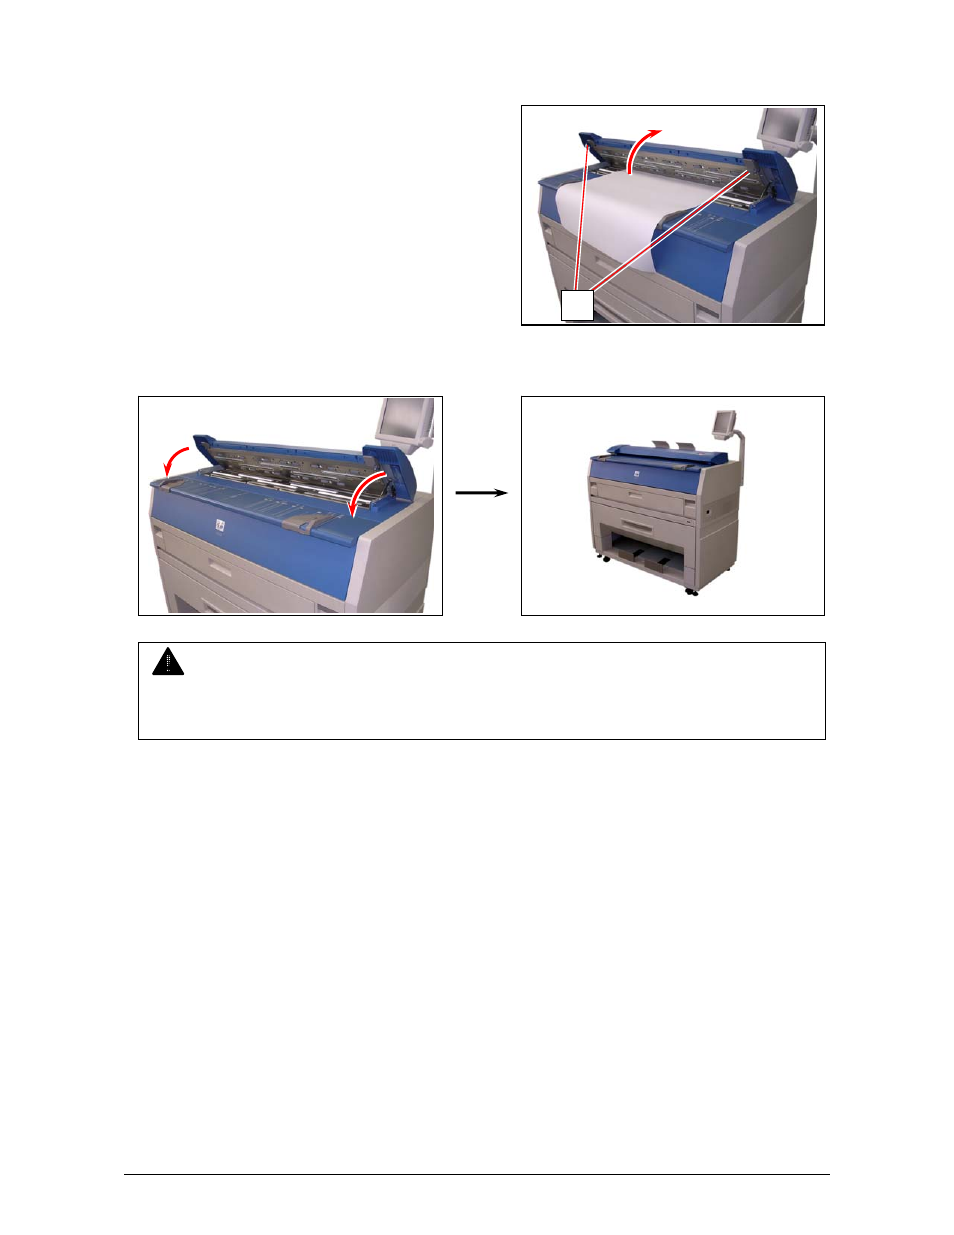 konica minolta kip 3100 user manual page 47 56 rh manualsdir com kip 3100 plotter manual kip 3100 service manual pdf